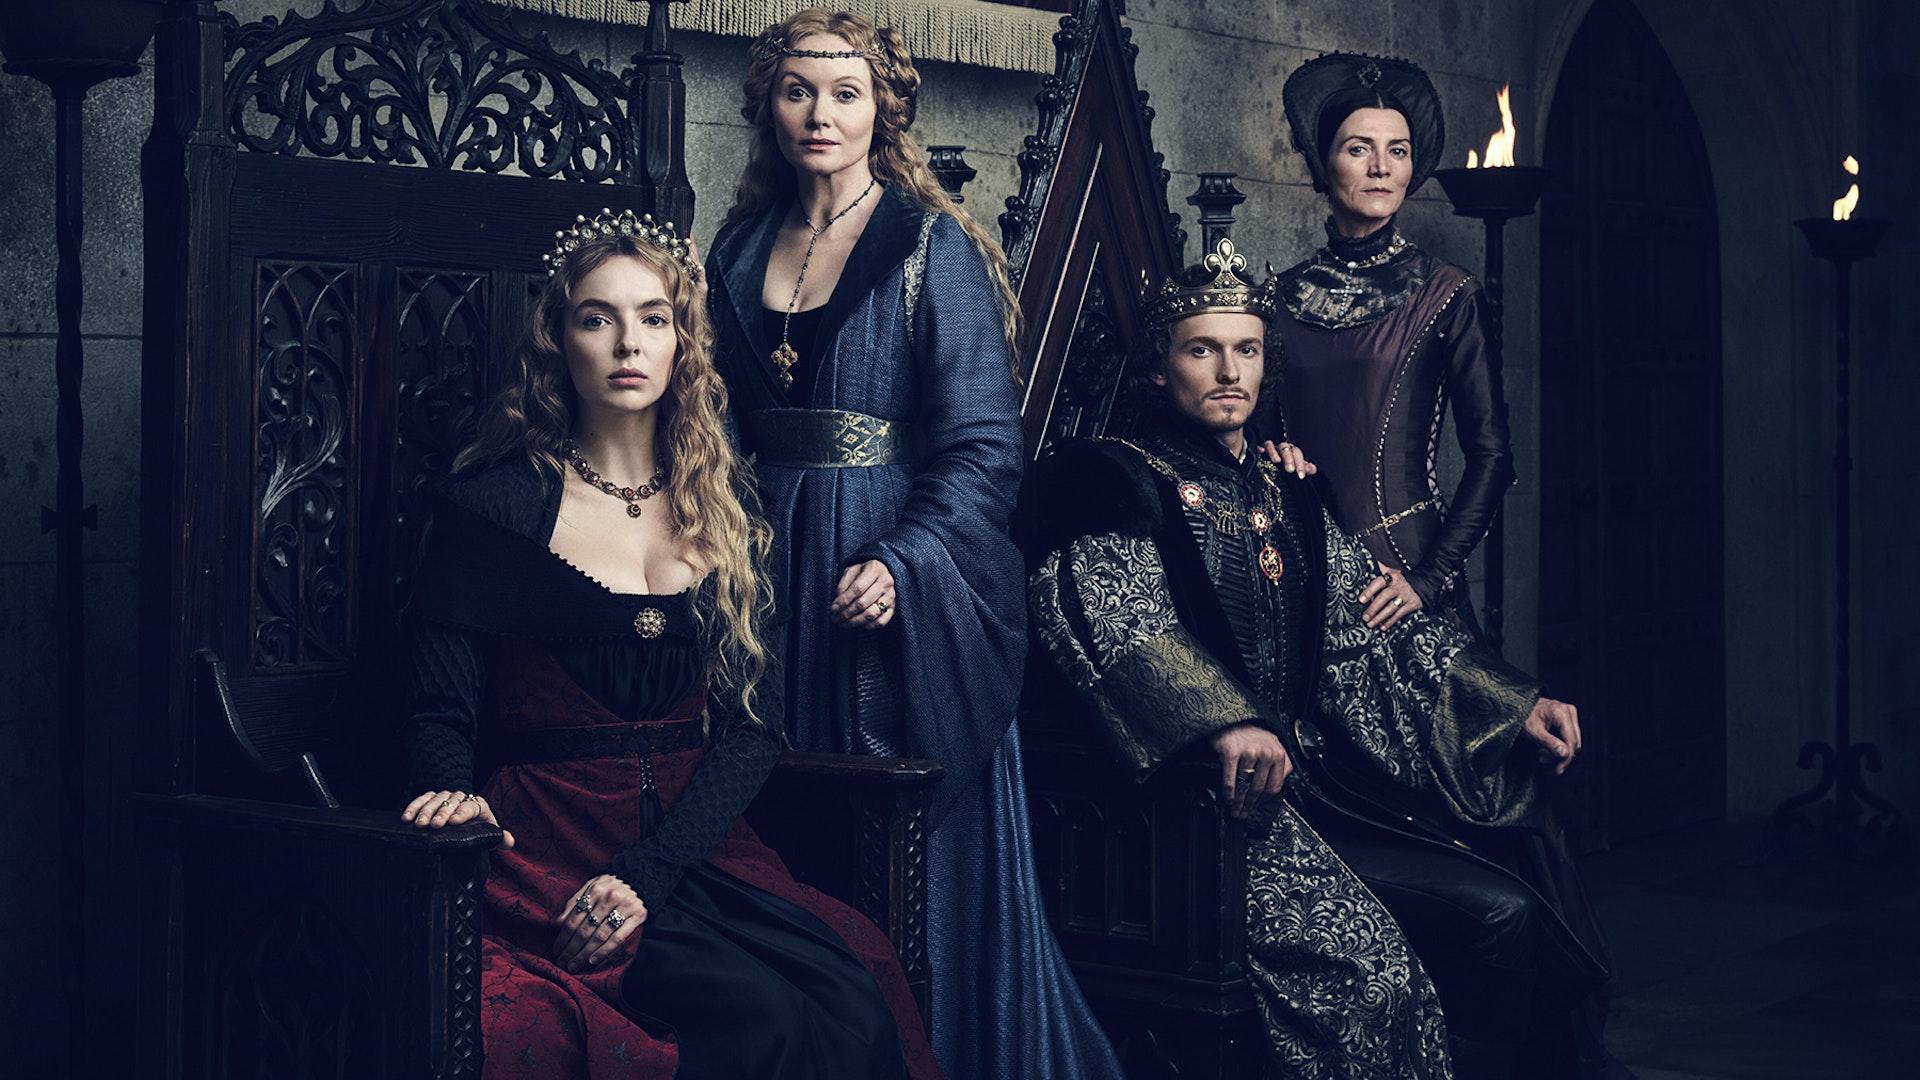 2 _ Jodie Comer (Elizabeth of York), Essie Davis (Dowager Queen Elizabeth), Jacob Collins-Levy (King Henry VII), Michelle Fairley (Lady Margaret Beaufort) copy